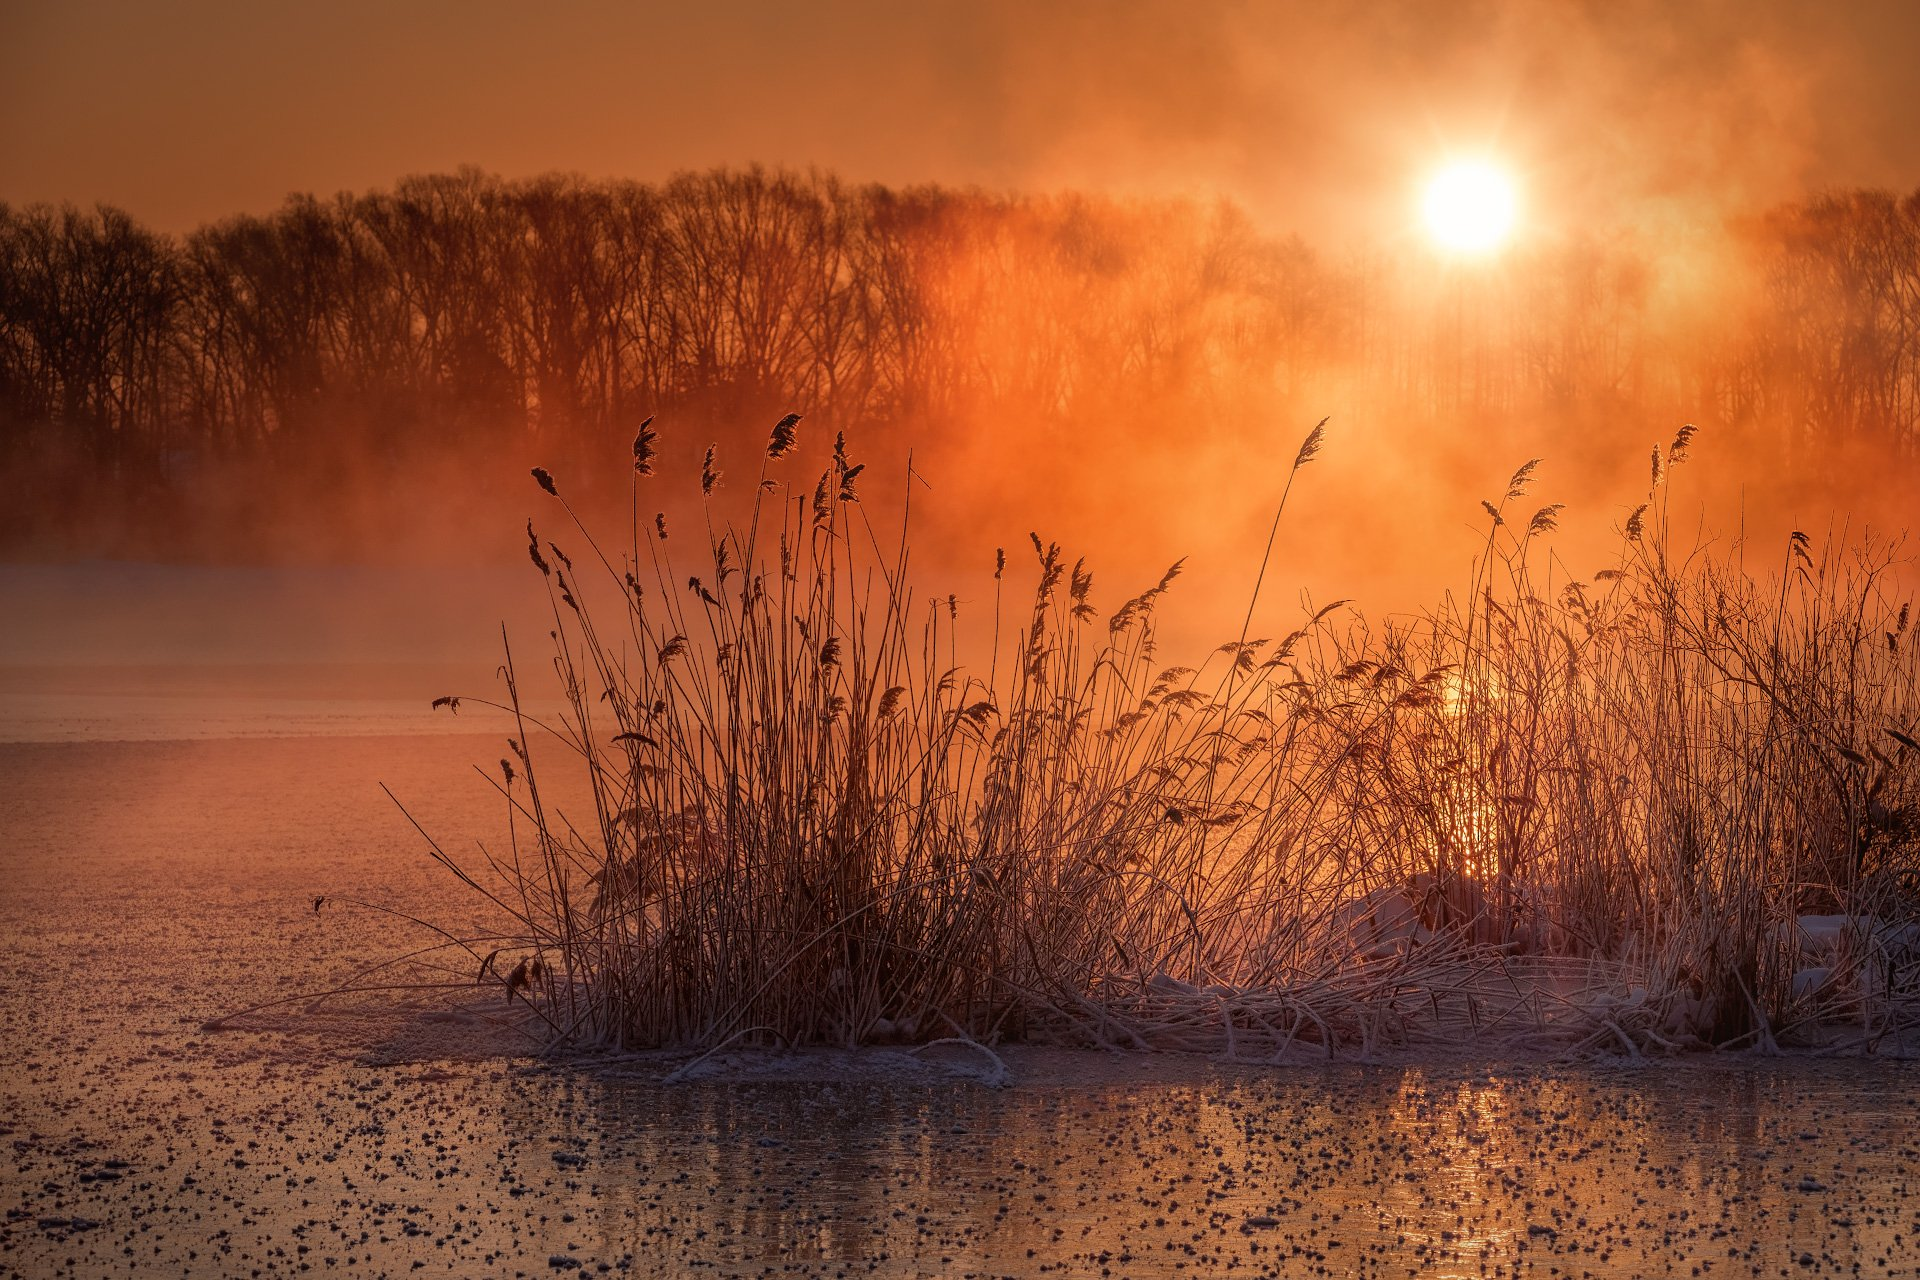 пейзаж, зима, озеро, лед, снег, утро, рассвет, восход, мороз, холод, шатура, Андрей Чиж